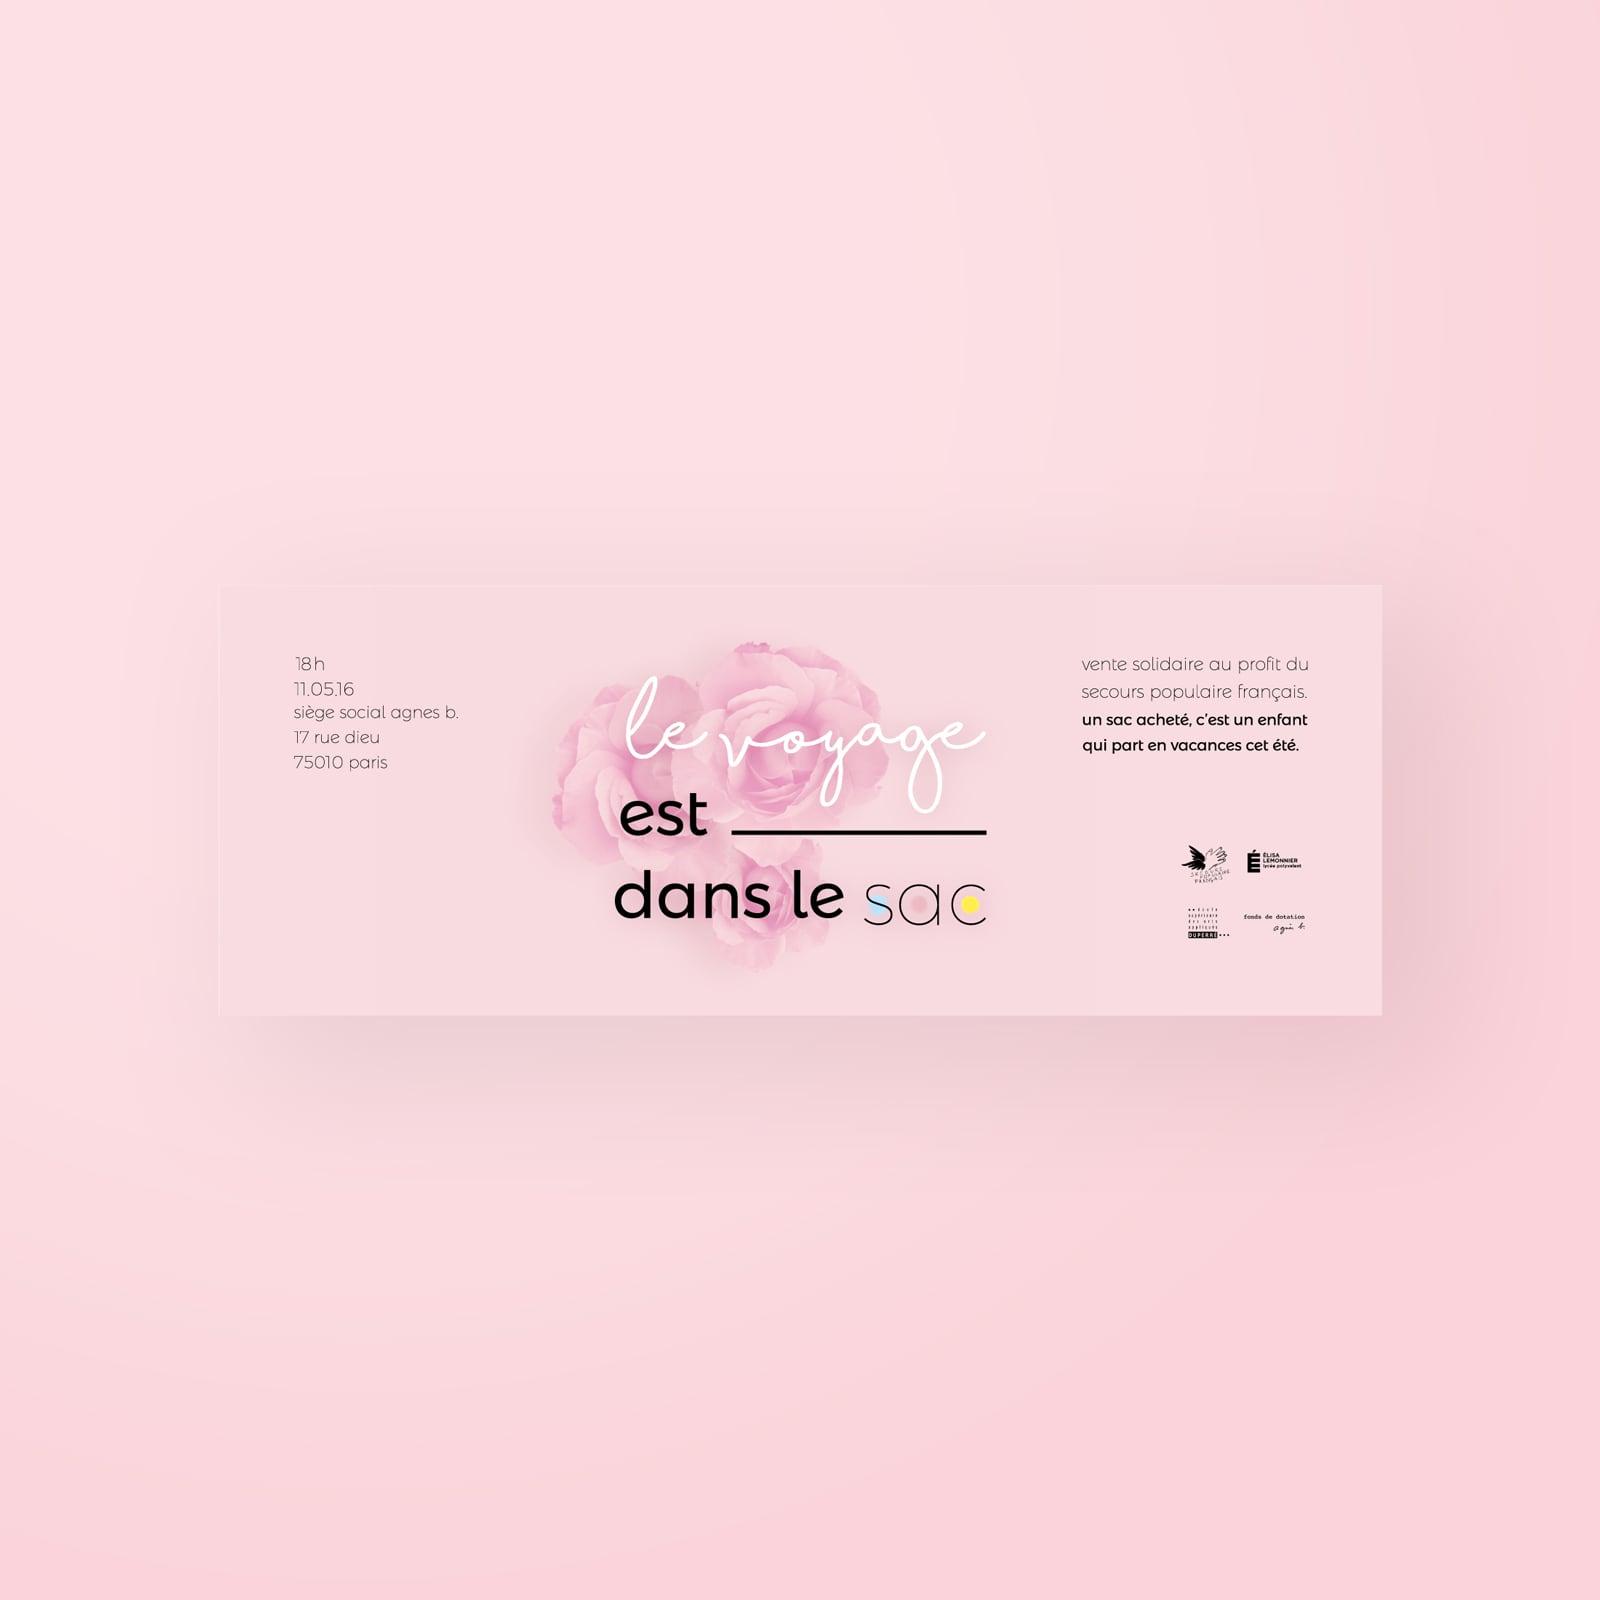 secours-populaire-paris-communication-digital-social-media-facebook-header-graphic-design